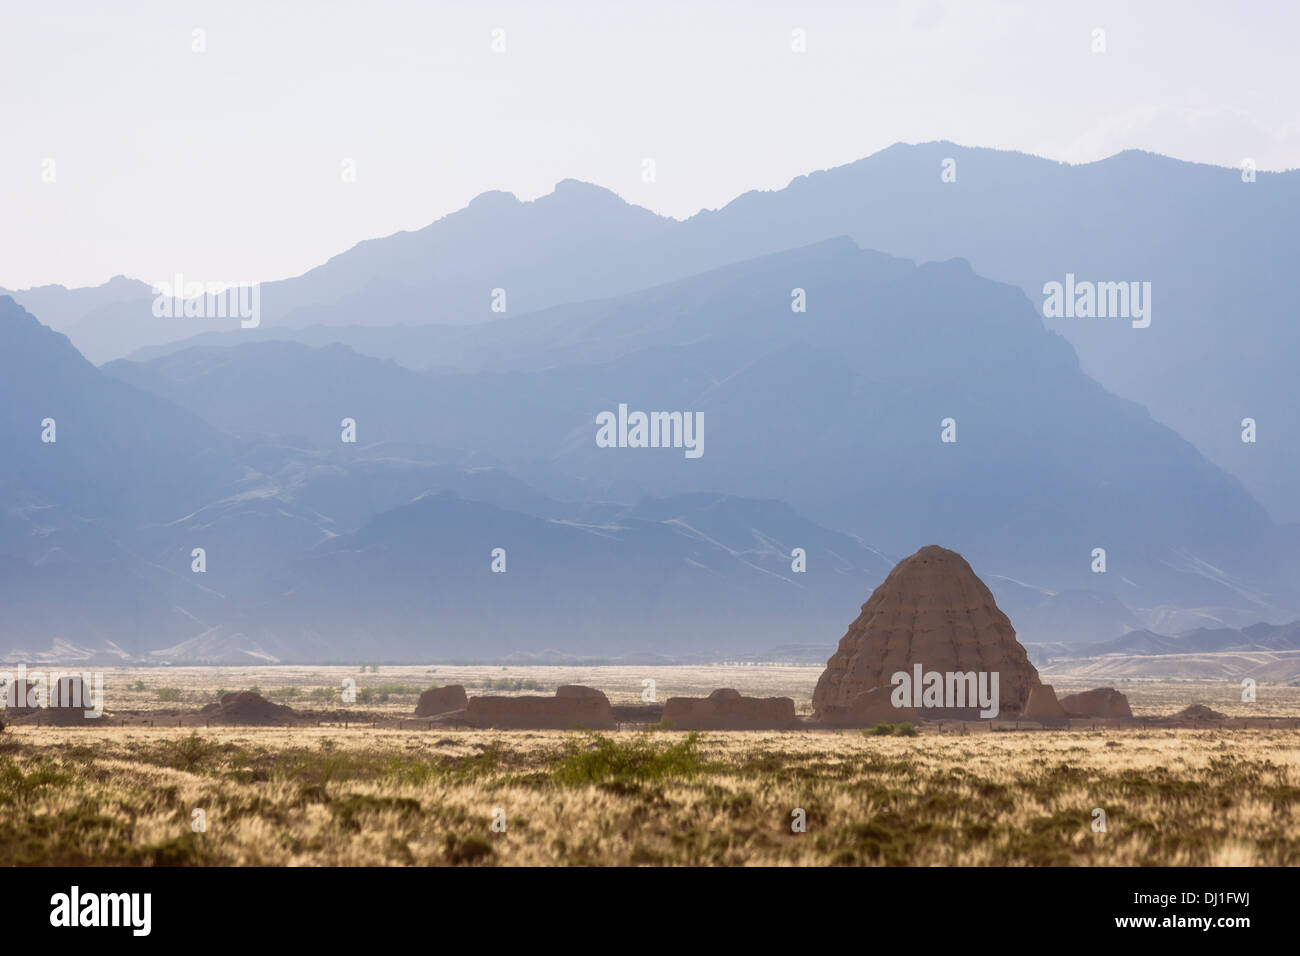 Tumbas imperiales, Xixia montañas Helan, paisaje en China Foto de stock